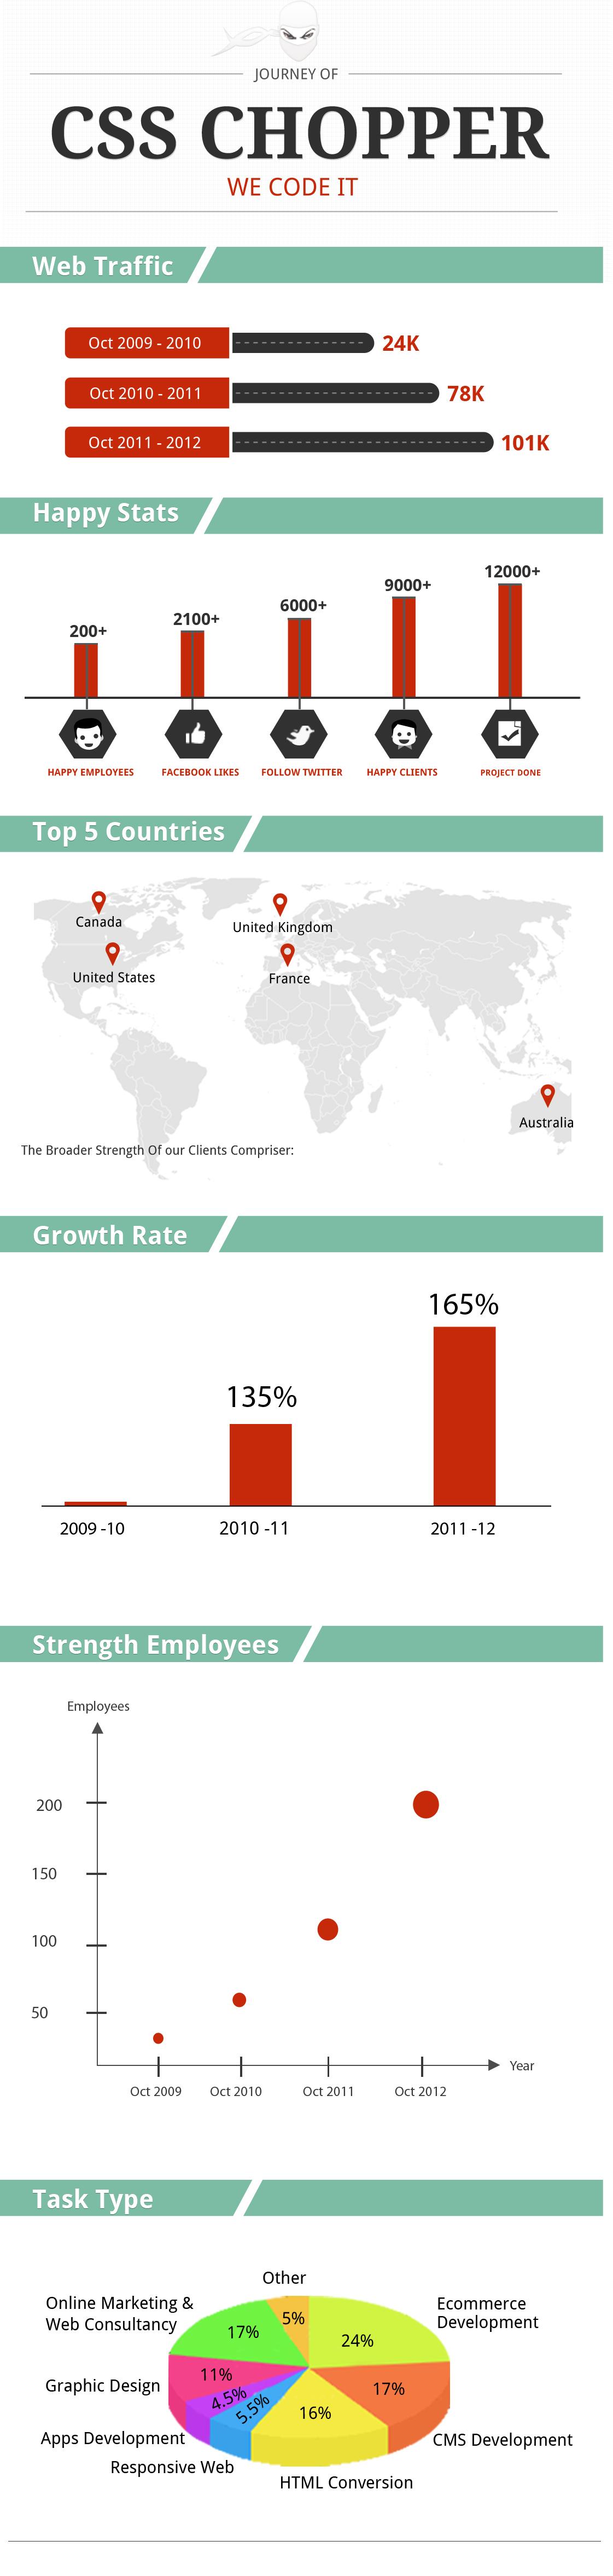 Csschopper Company Infographic